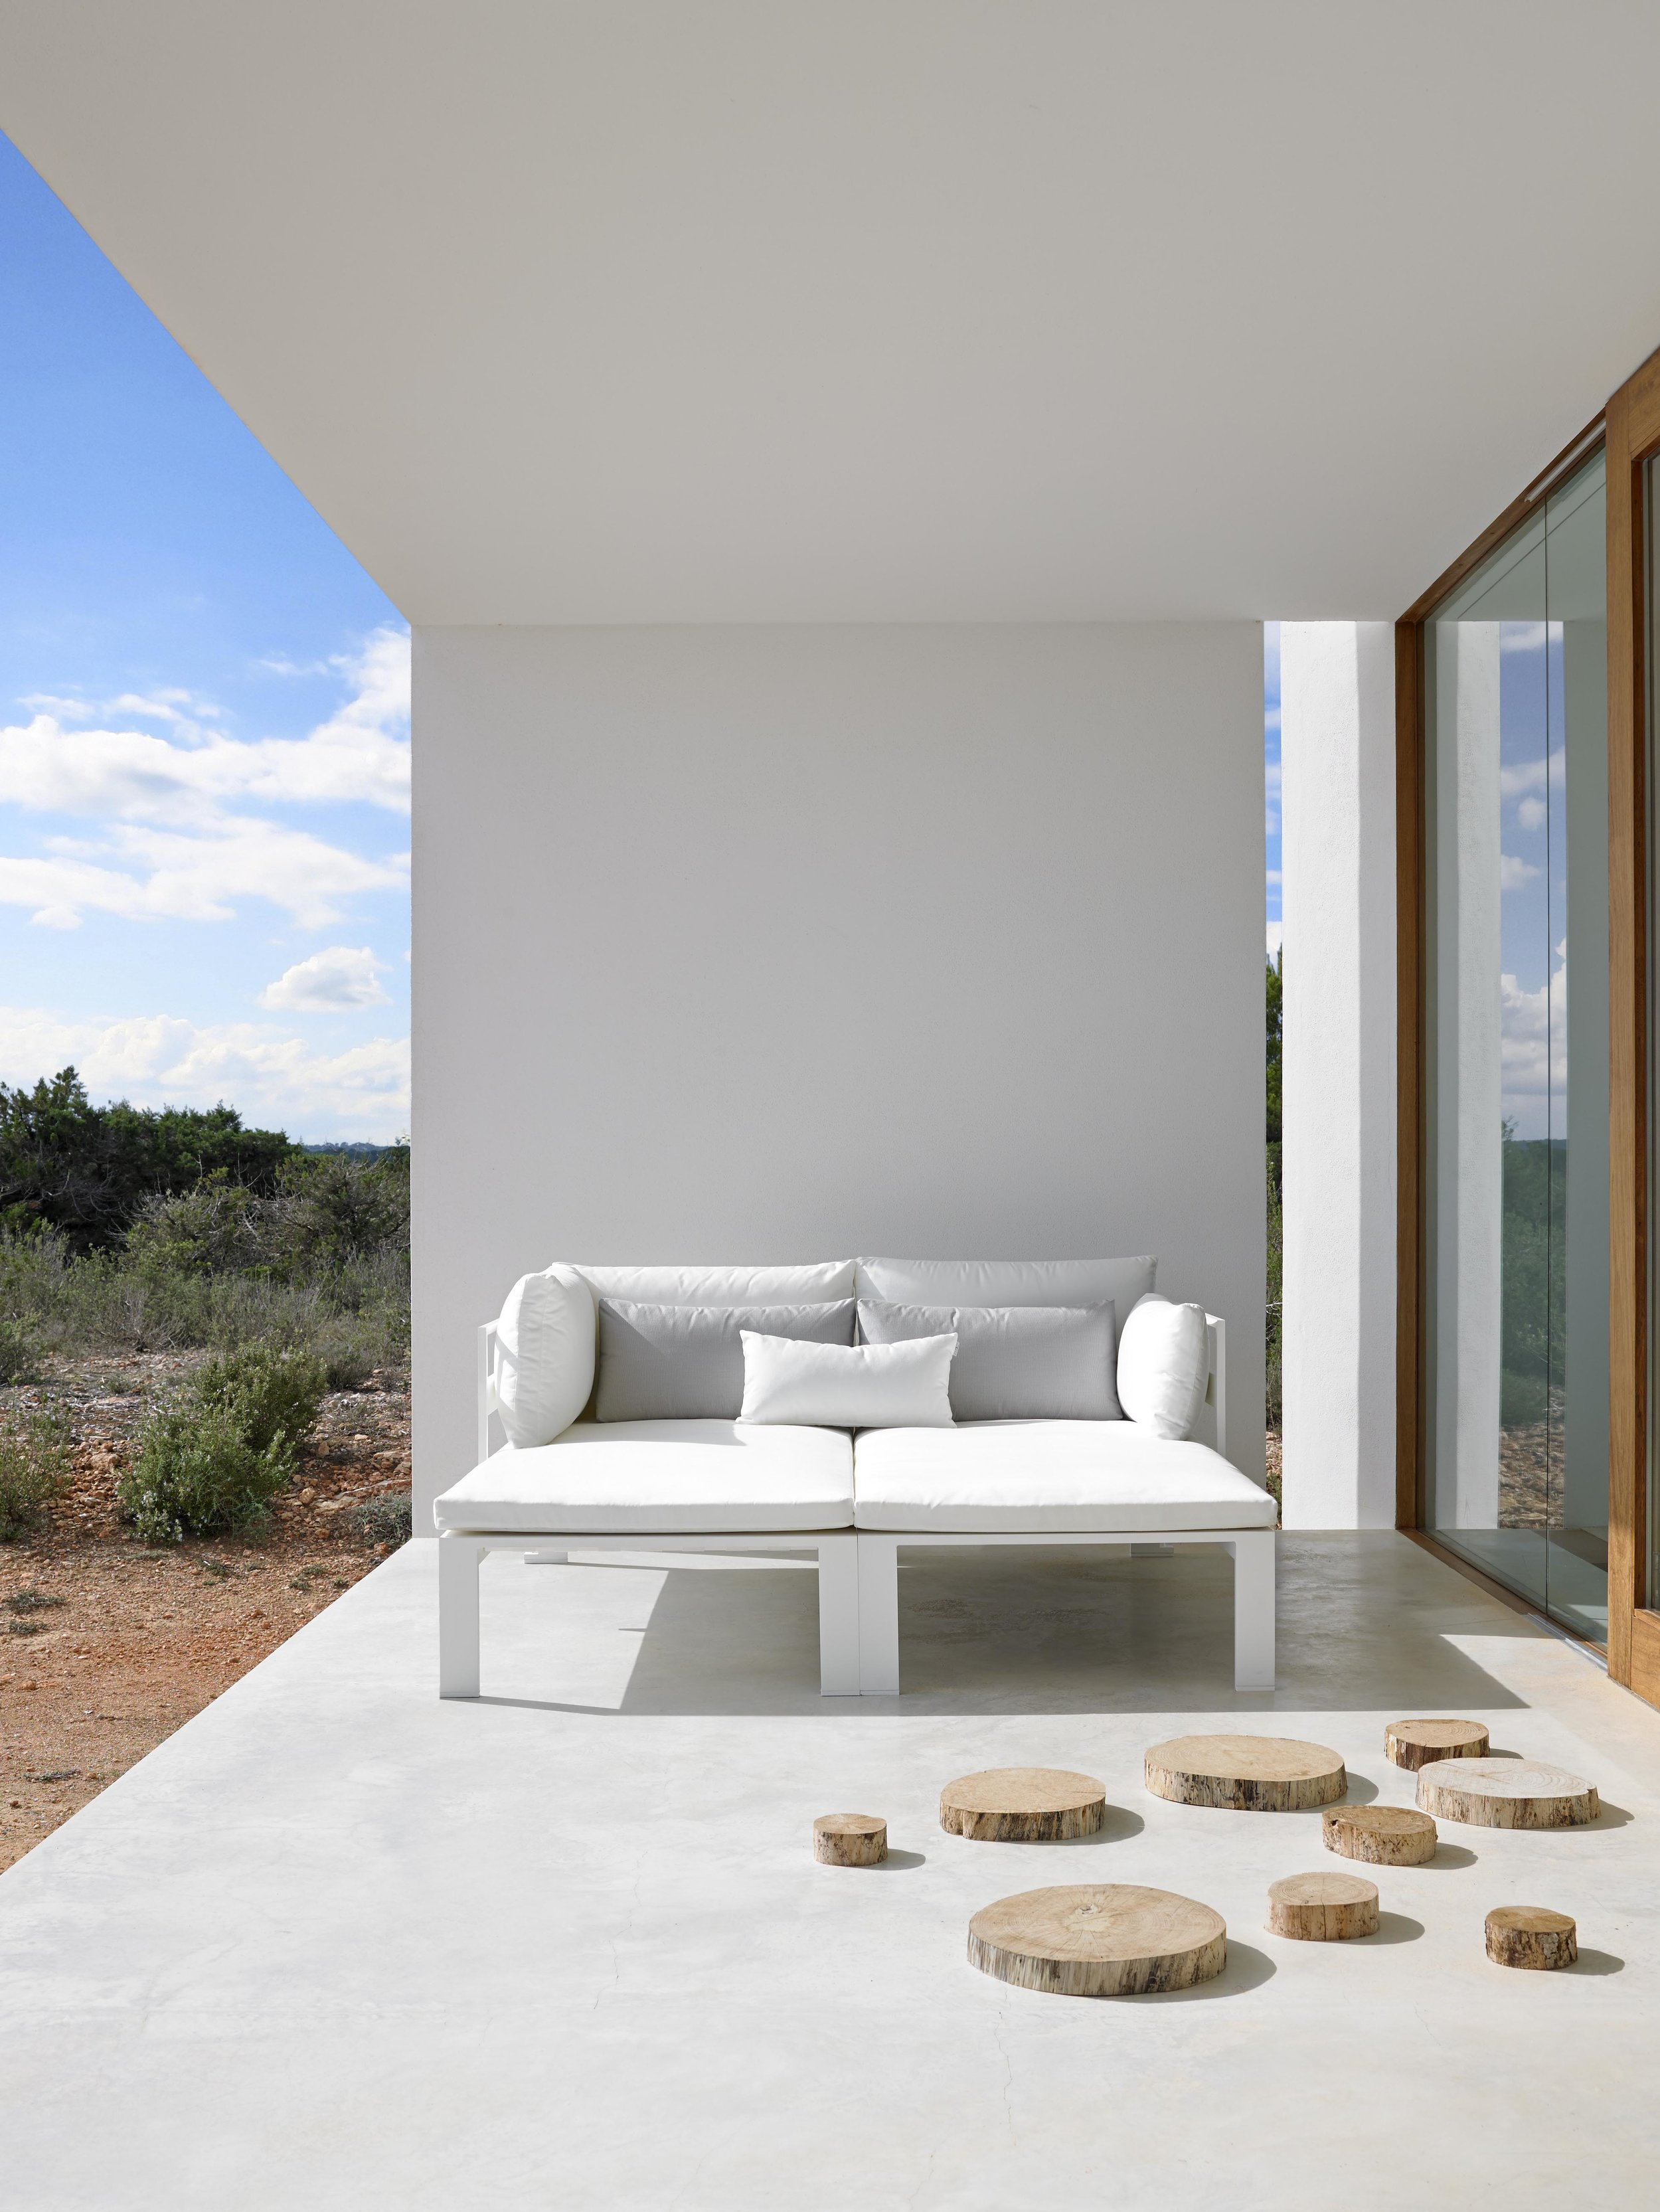 jian-white-modular-sofa-2-ambience-image.jpg